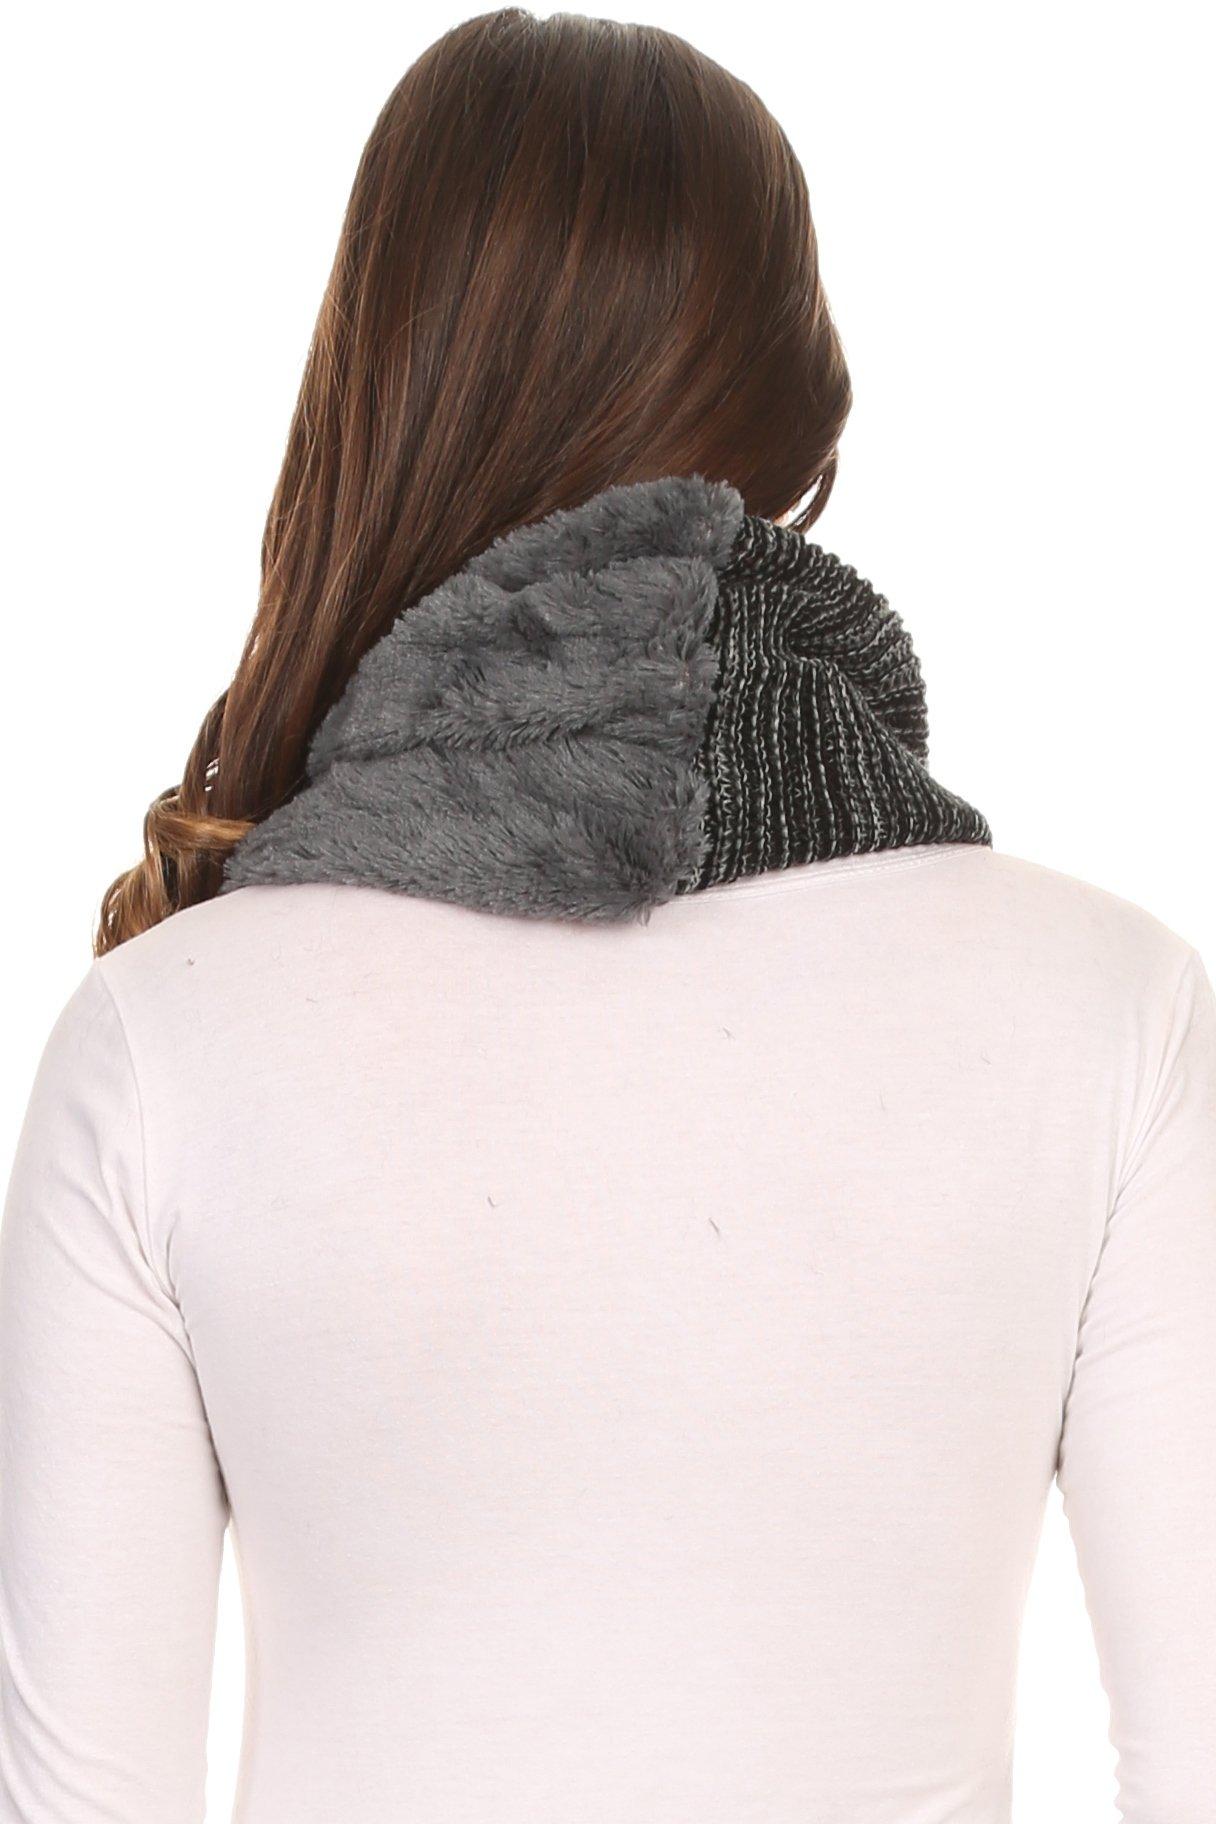 Sakkas 16107 - Sele Short Two Textured Faux Fur Ribbed Knit Mixed Designed Infinity Scarf - Grey - OS by Sakkas (Image #2)